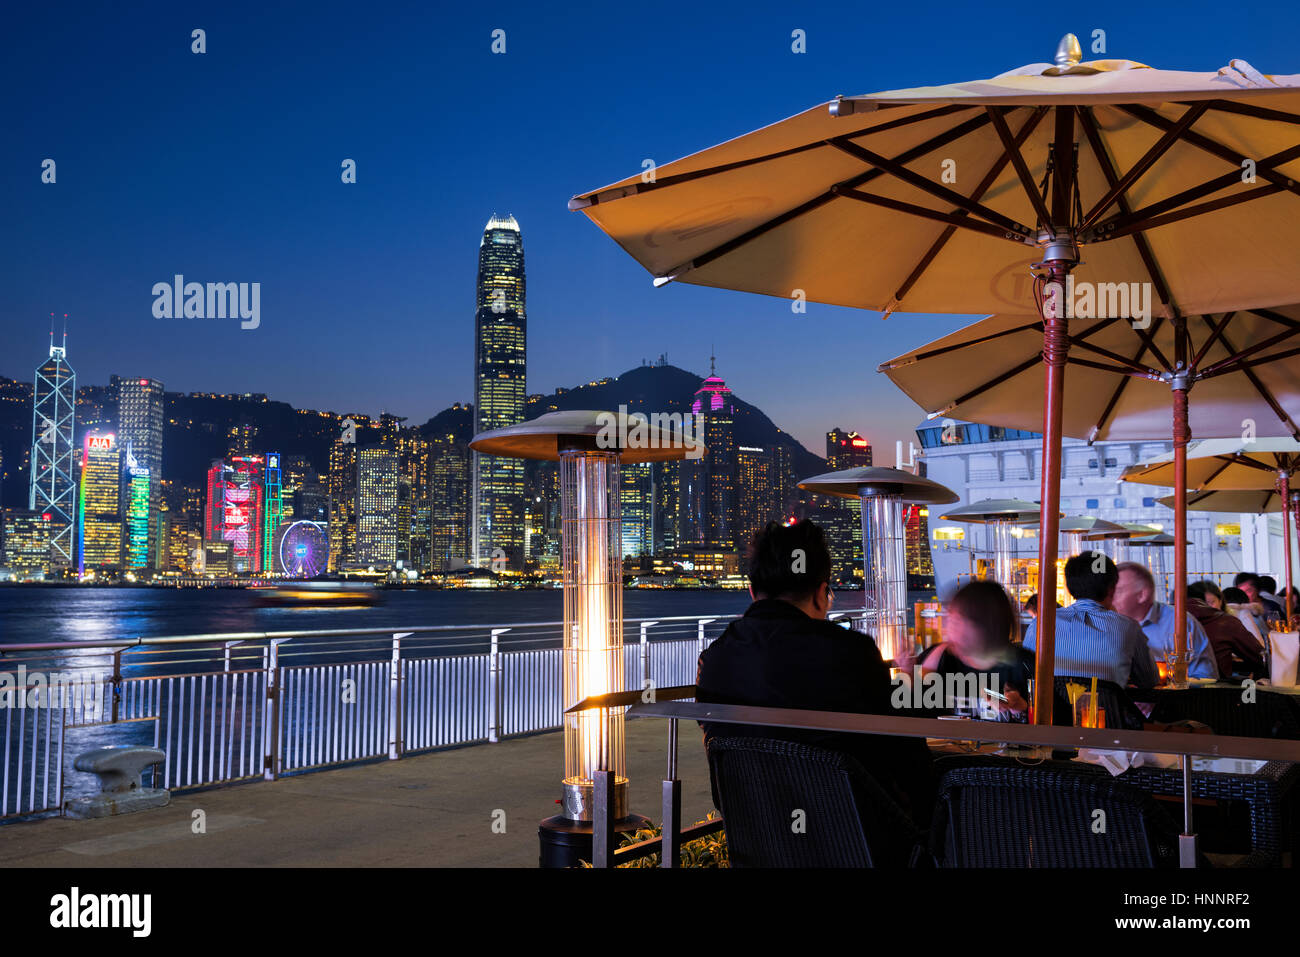 Outdoor-Restaurant mit Blick auf die Skyline von Hong Kong, Hong Kong, China. Stockbild